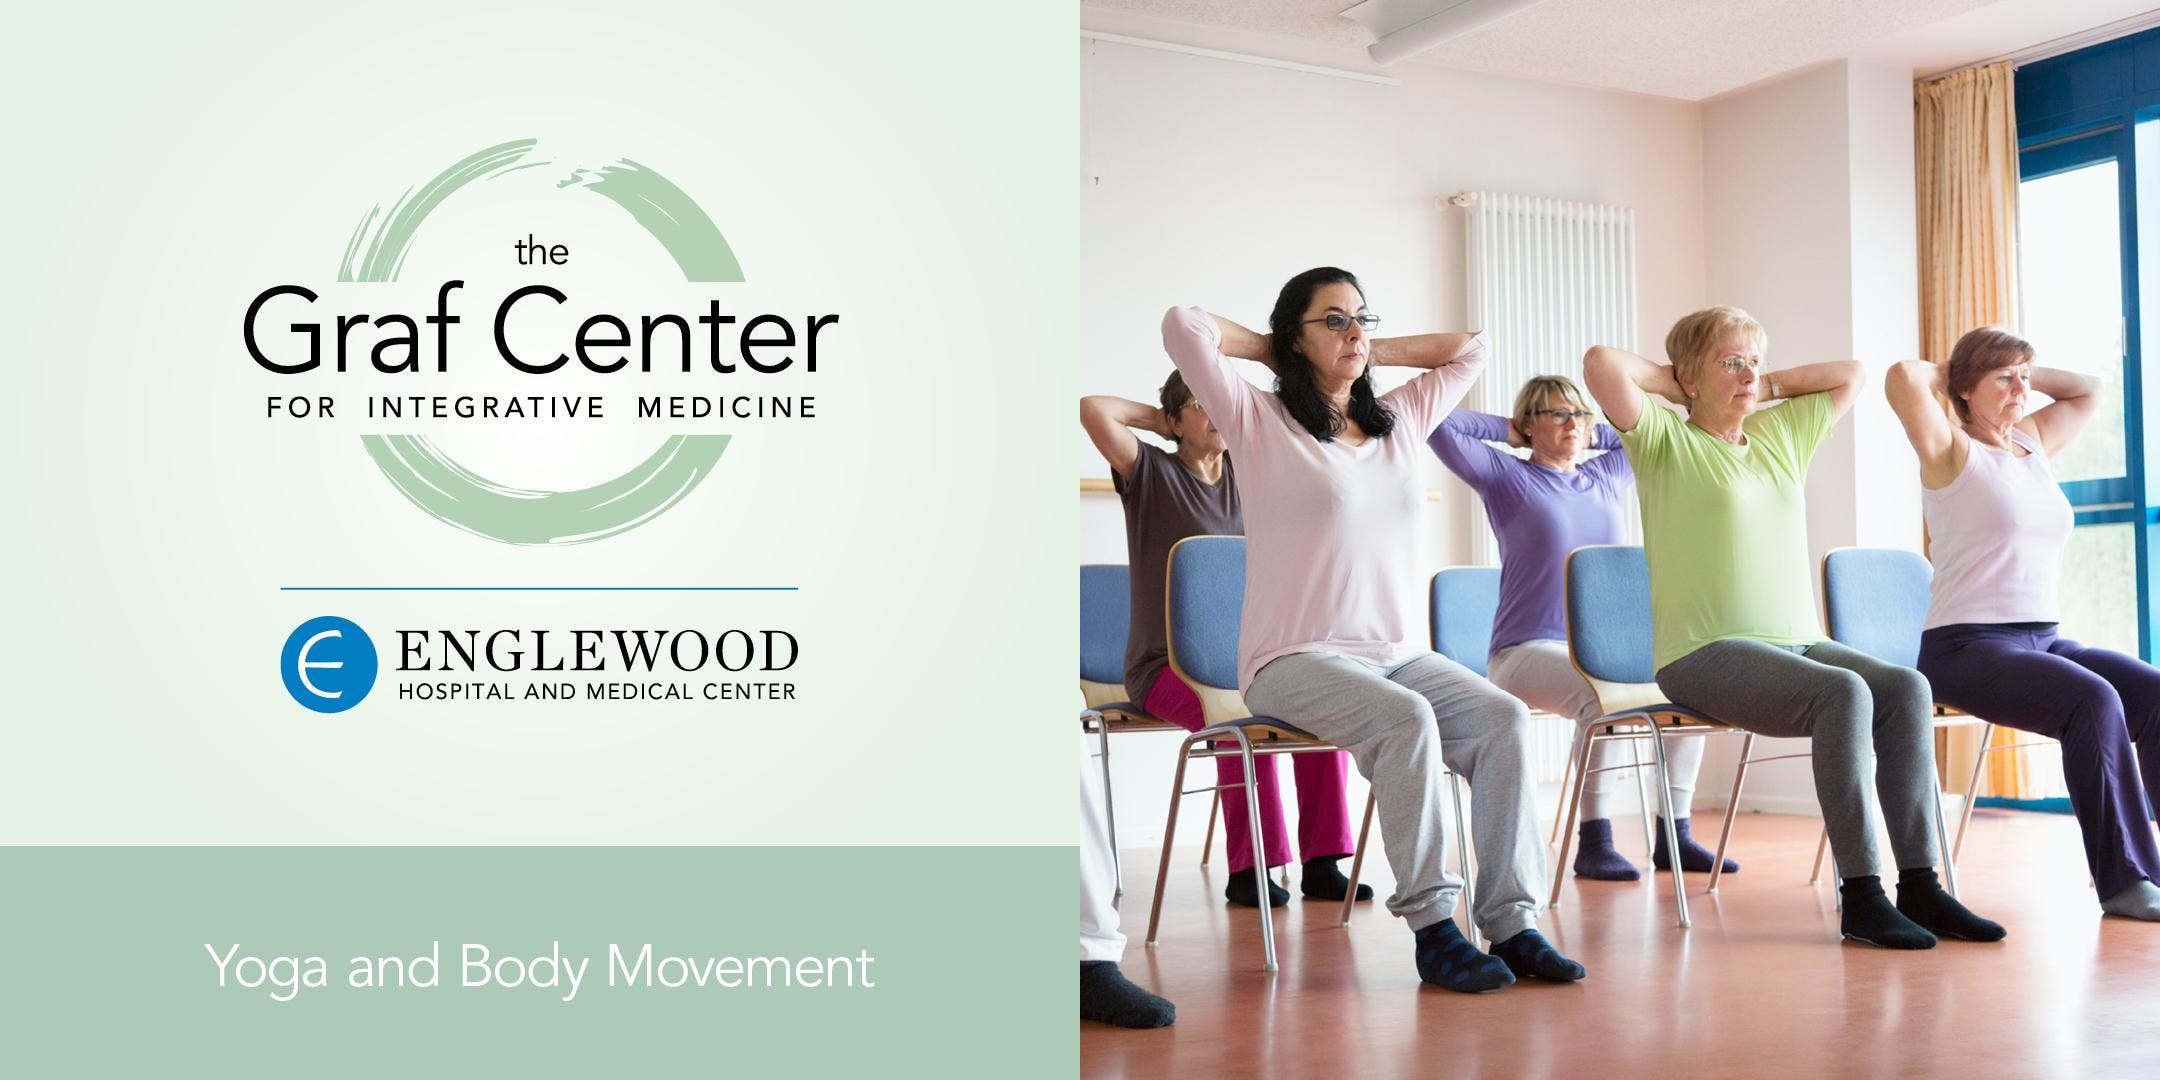 More info: Therapeutic Chair Yoga